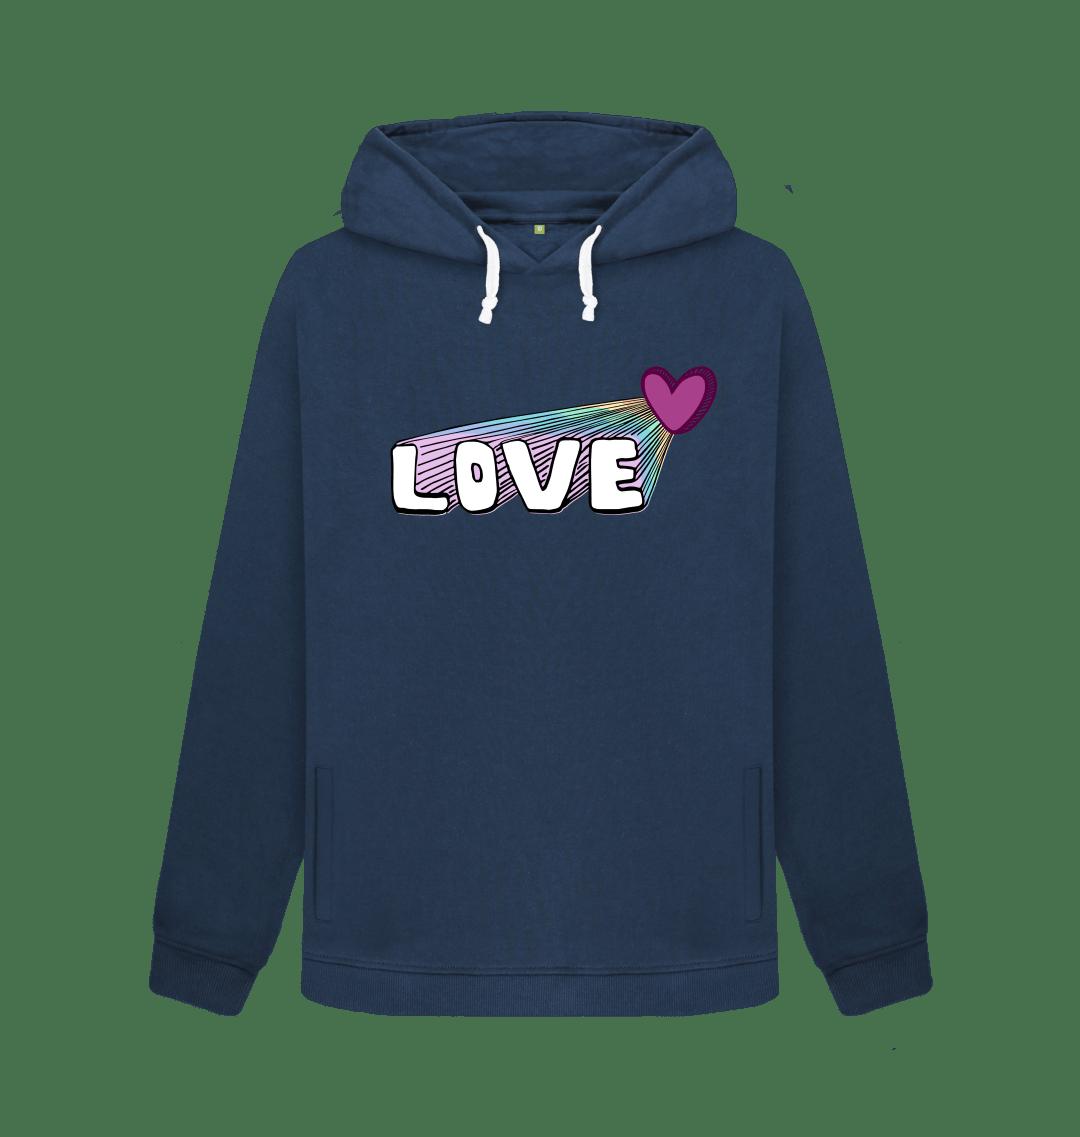 Let Your Love Shine Women's Hoodie Kind Shop